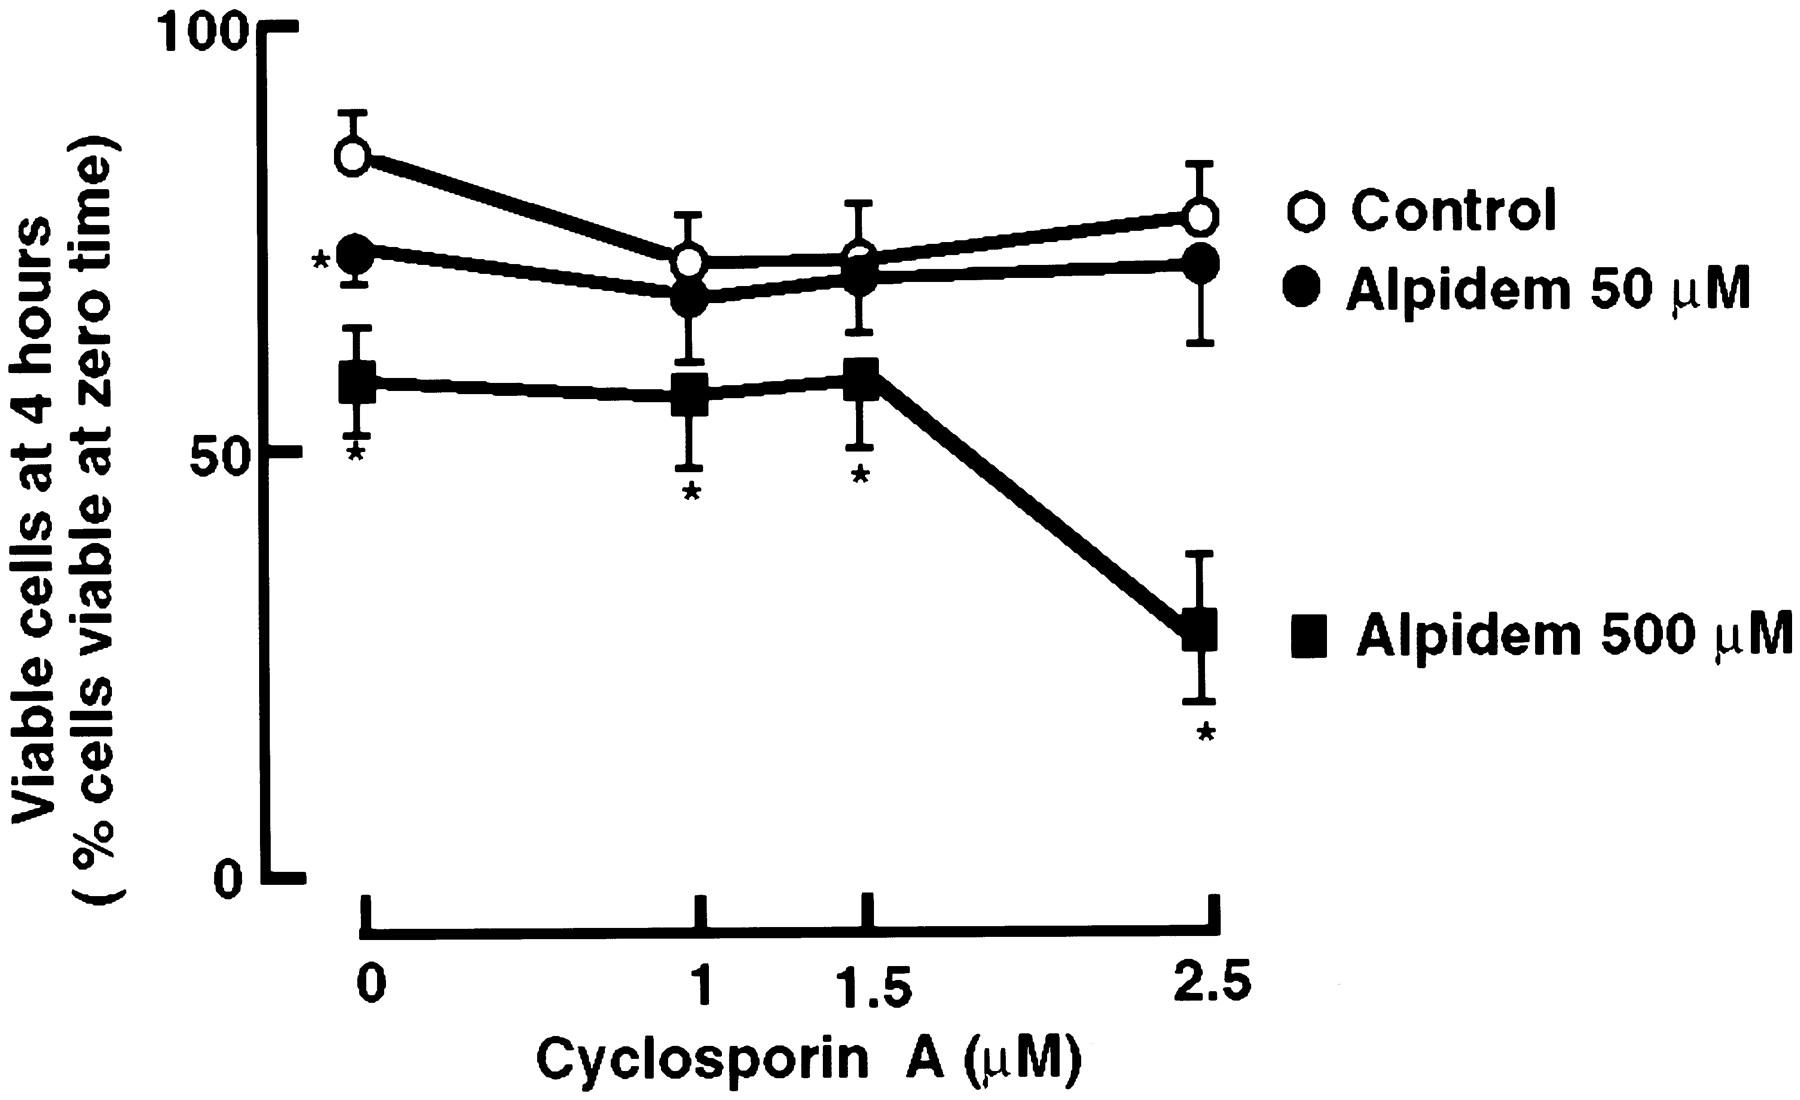 Toxicity of Alpidem, a Peripheral Benzodiazepine Receptor